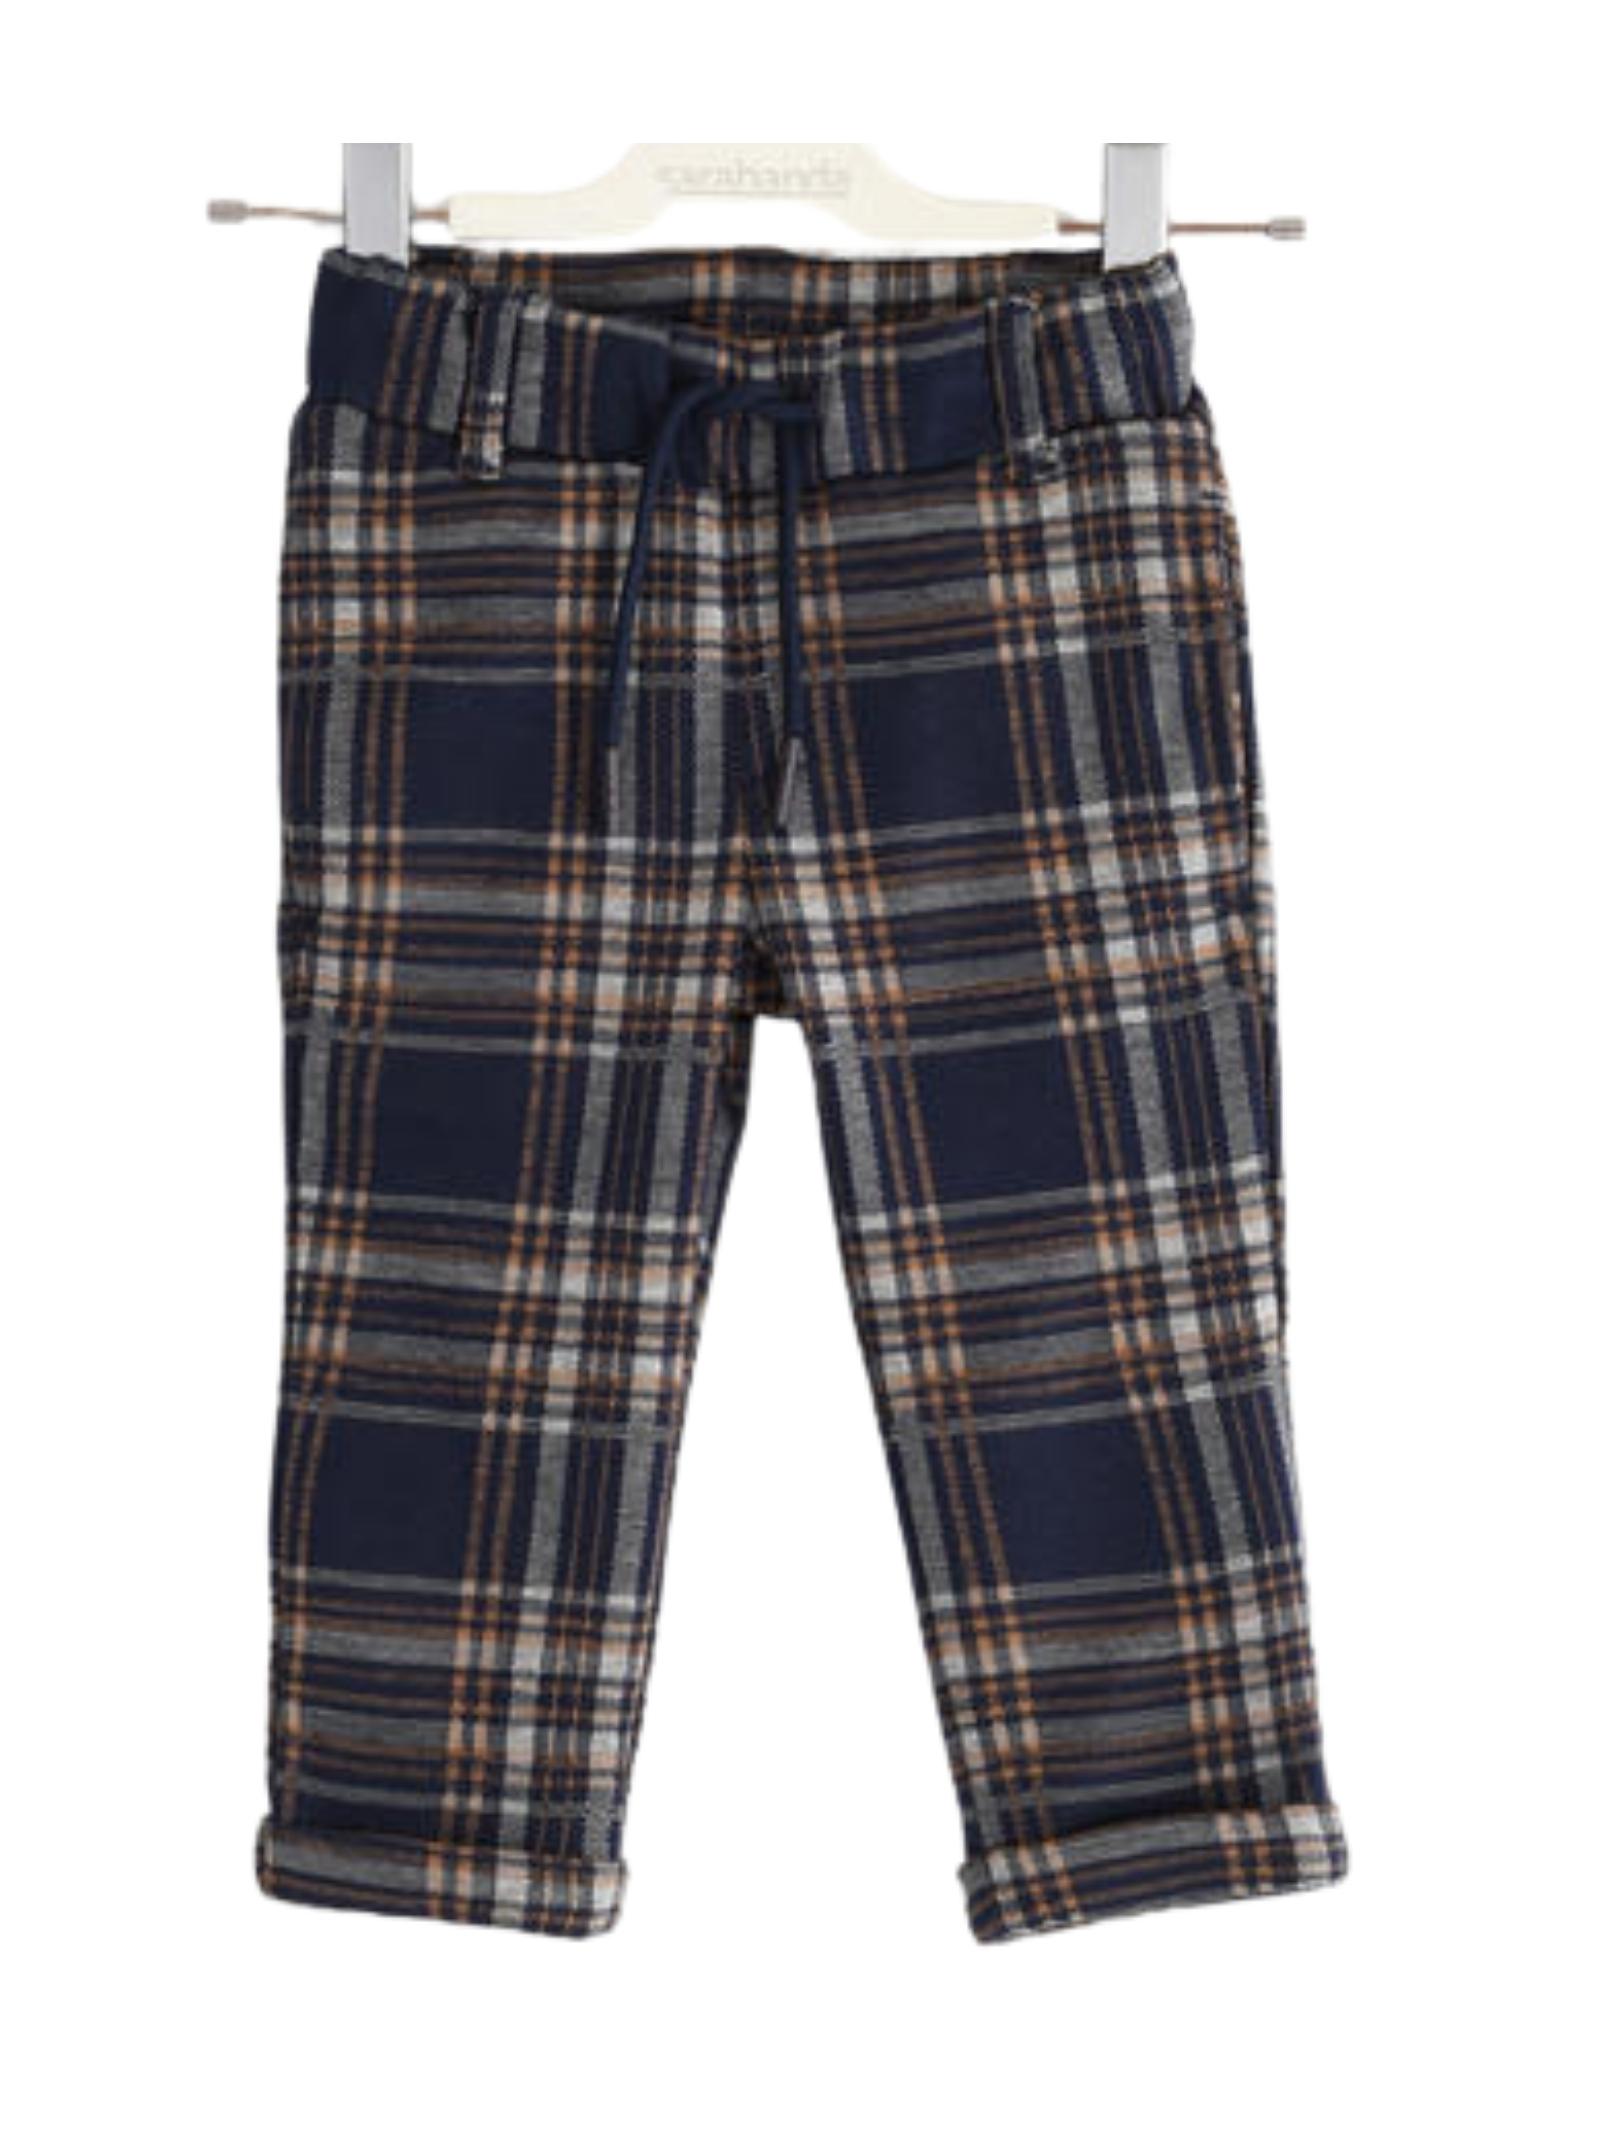 Children's Checkered Cotton Trousers SARABANDA | Trousers | 03152003854